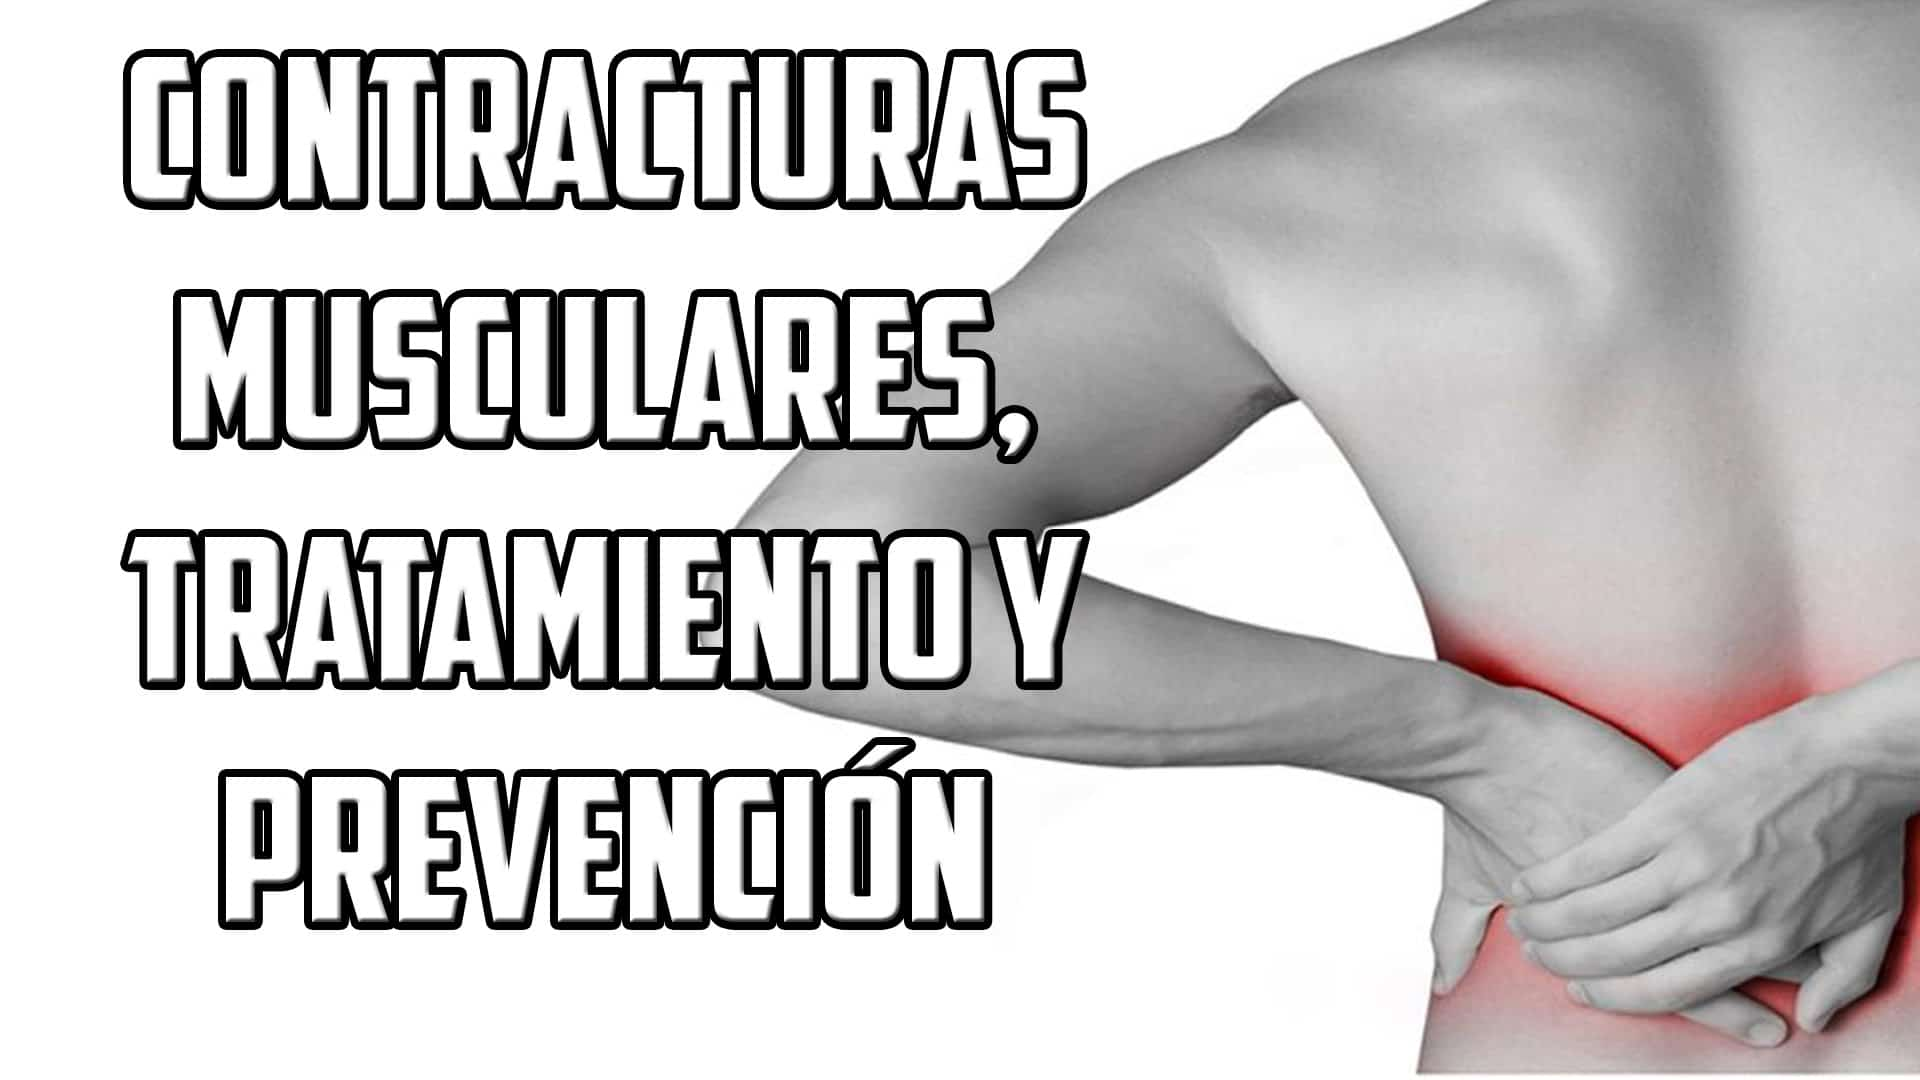 Tipos de contracción muscular-18